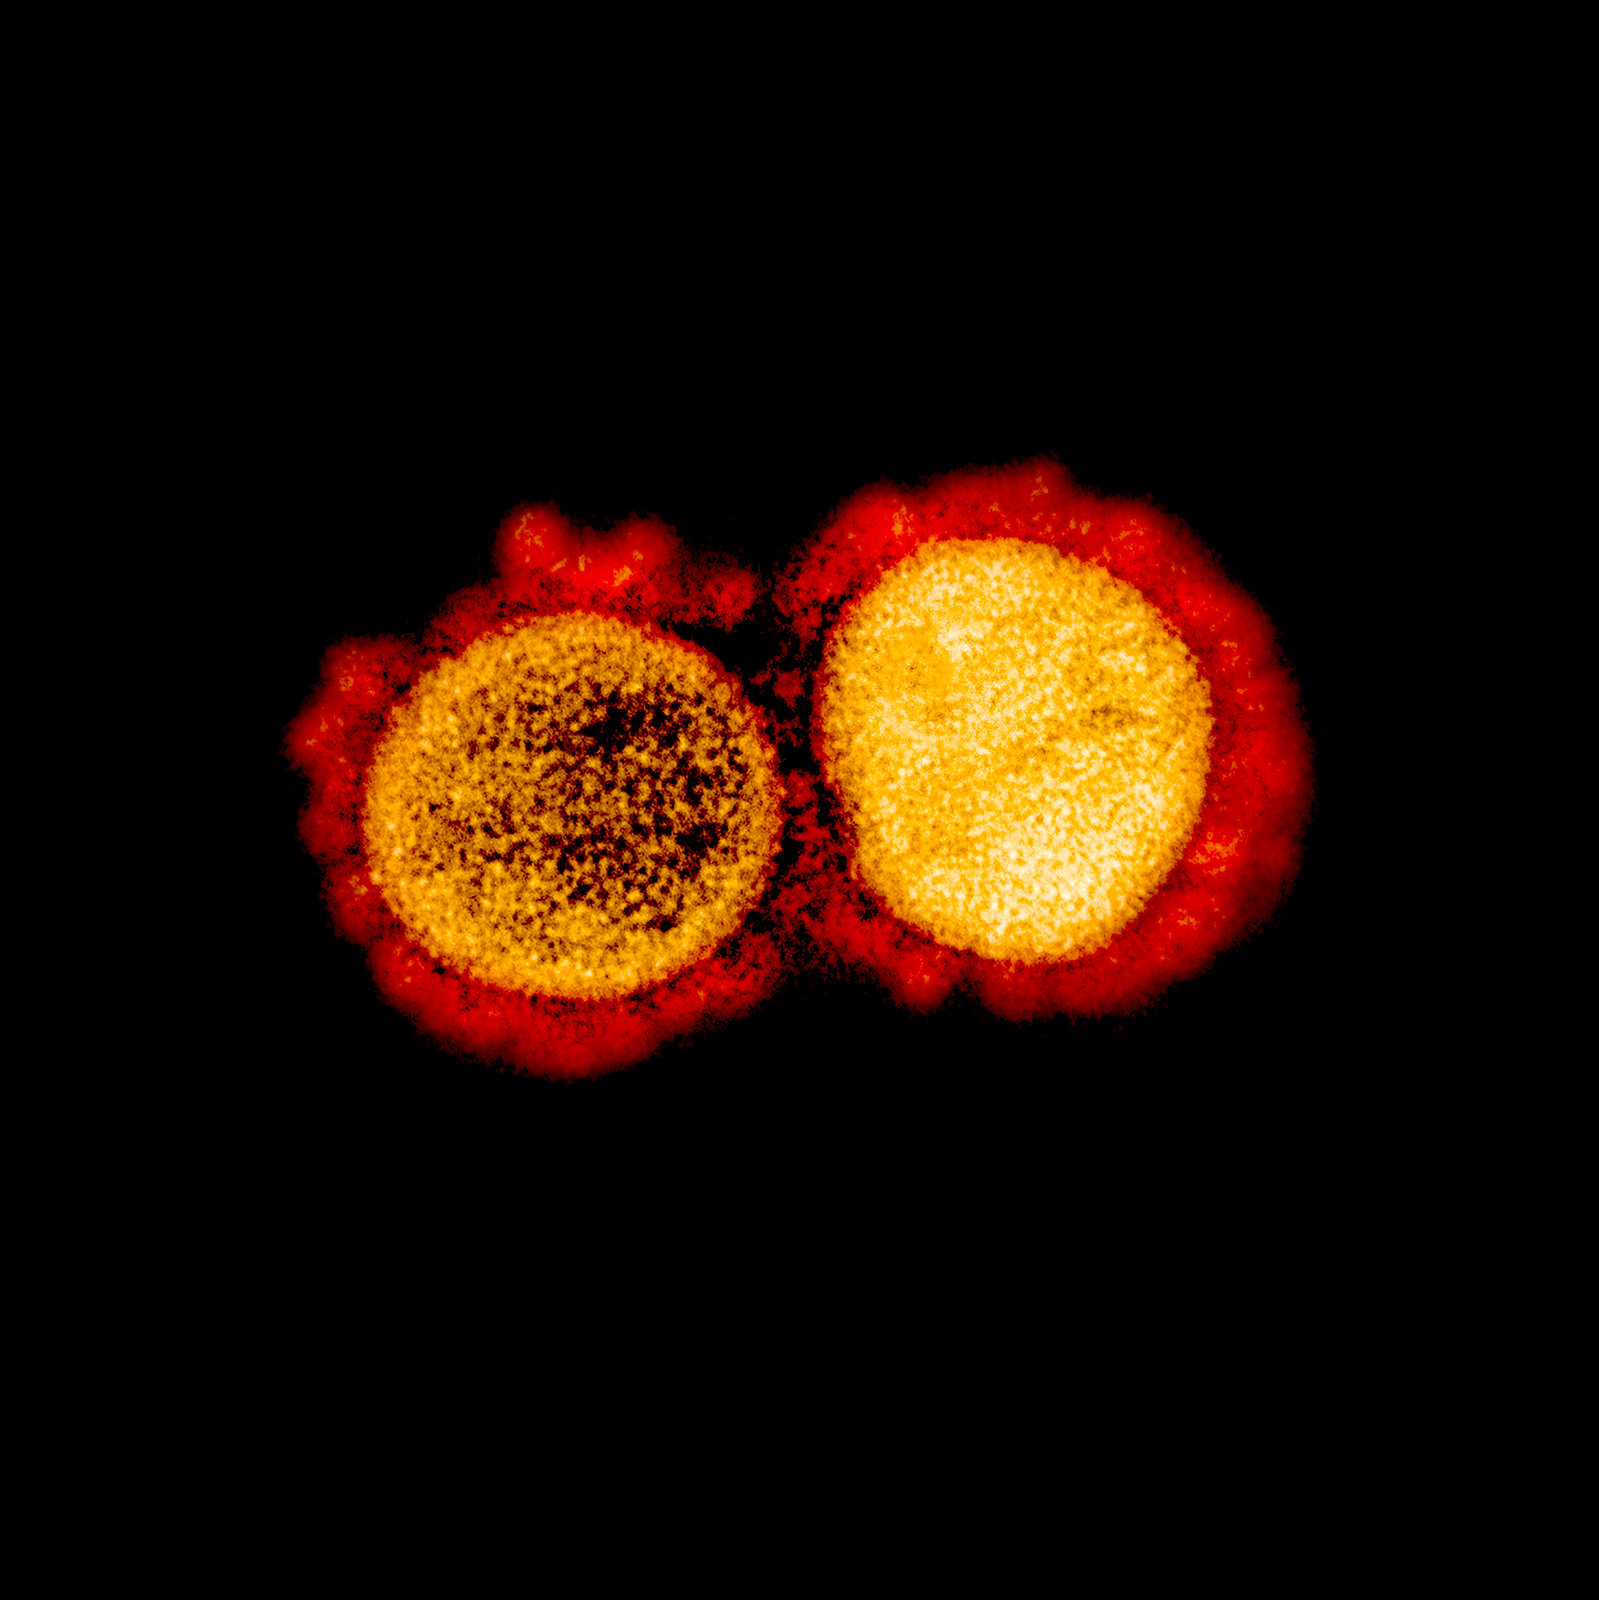 7. Transmission electron micrograph of SARS-CoV-2